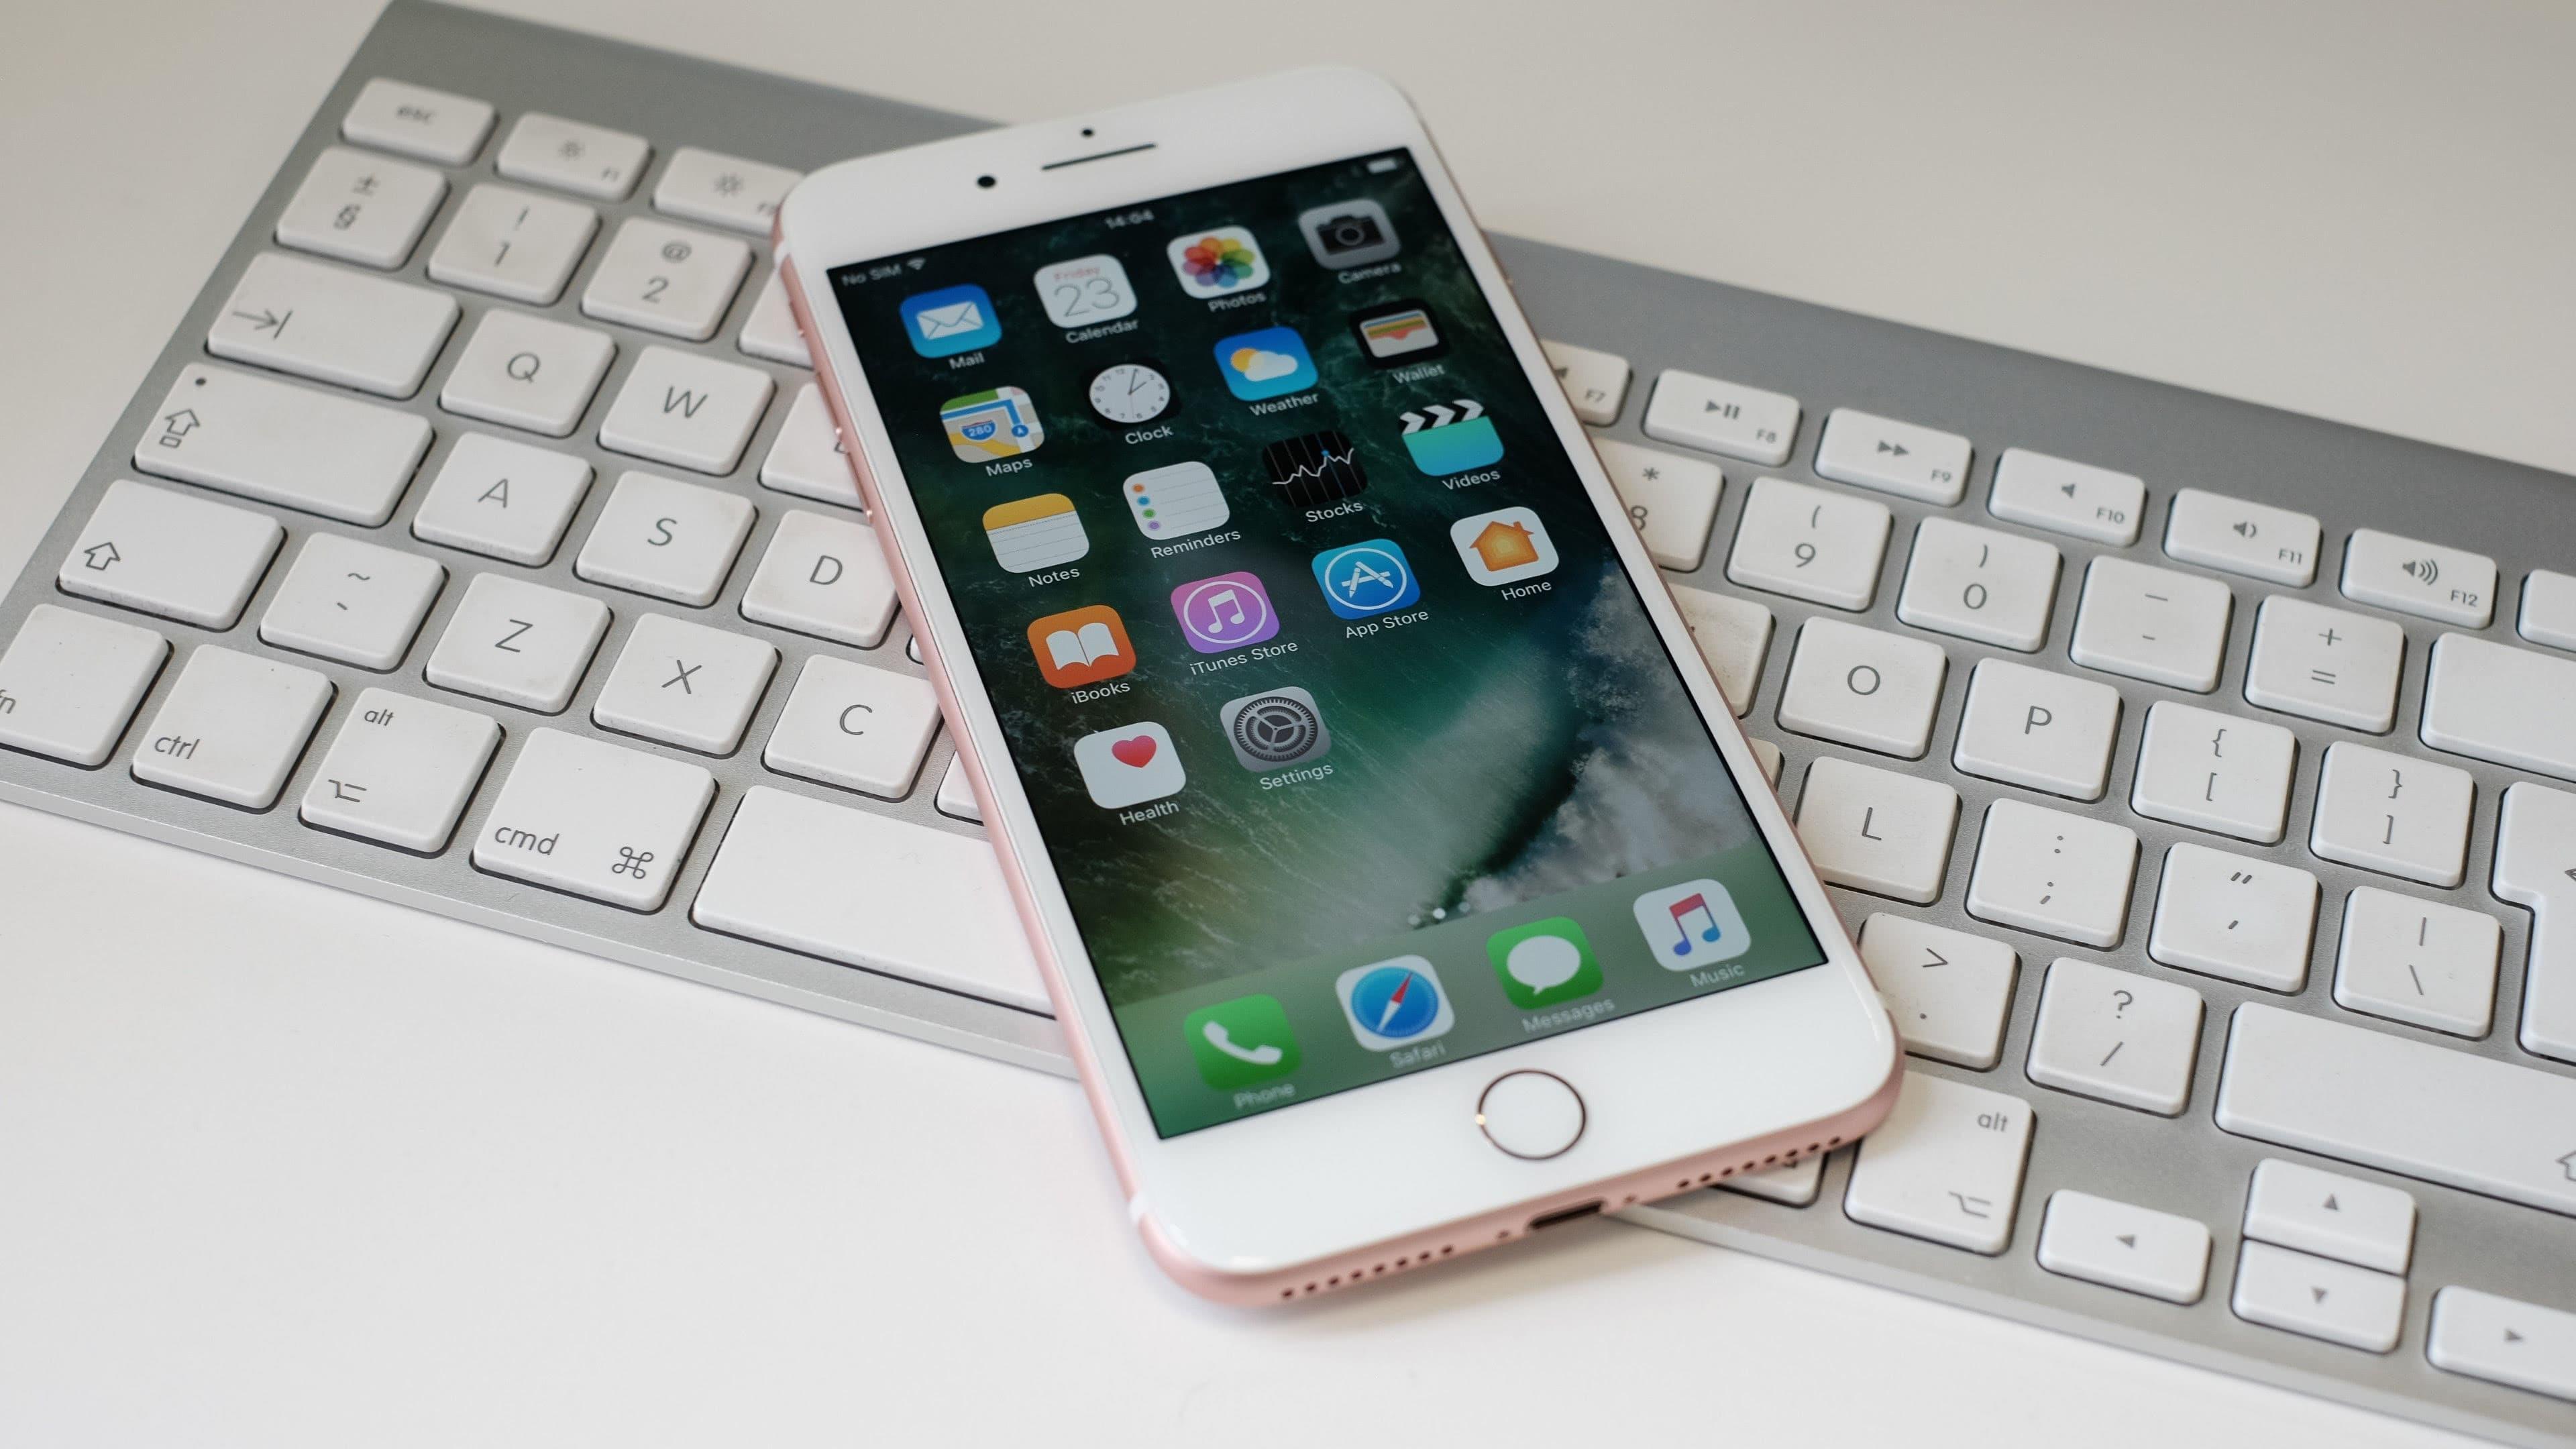 iPhone 7 Plus UHD 4K Wallpaper | Pixelz